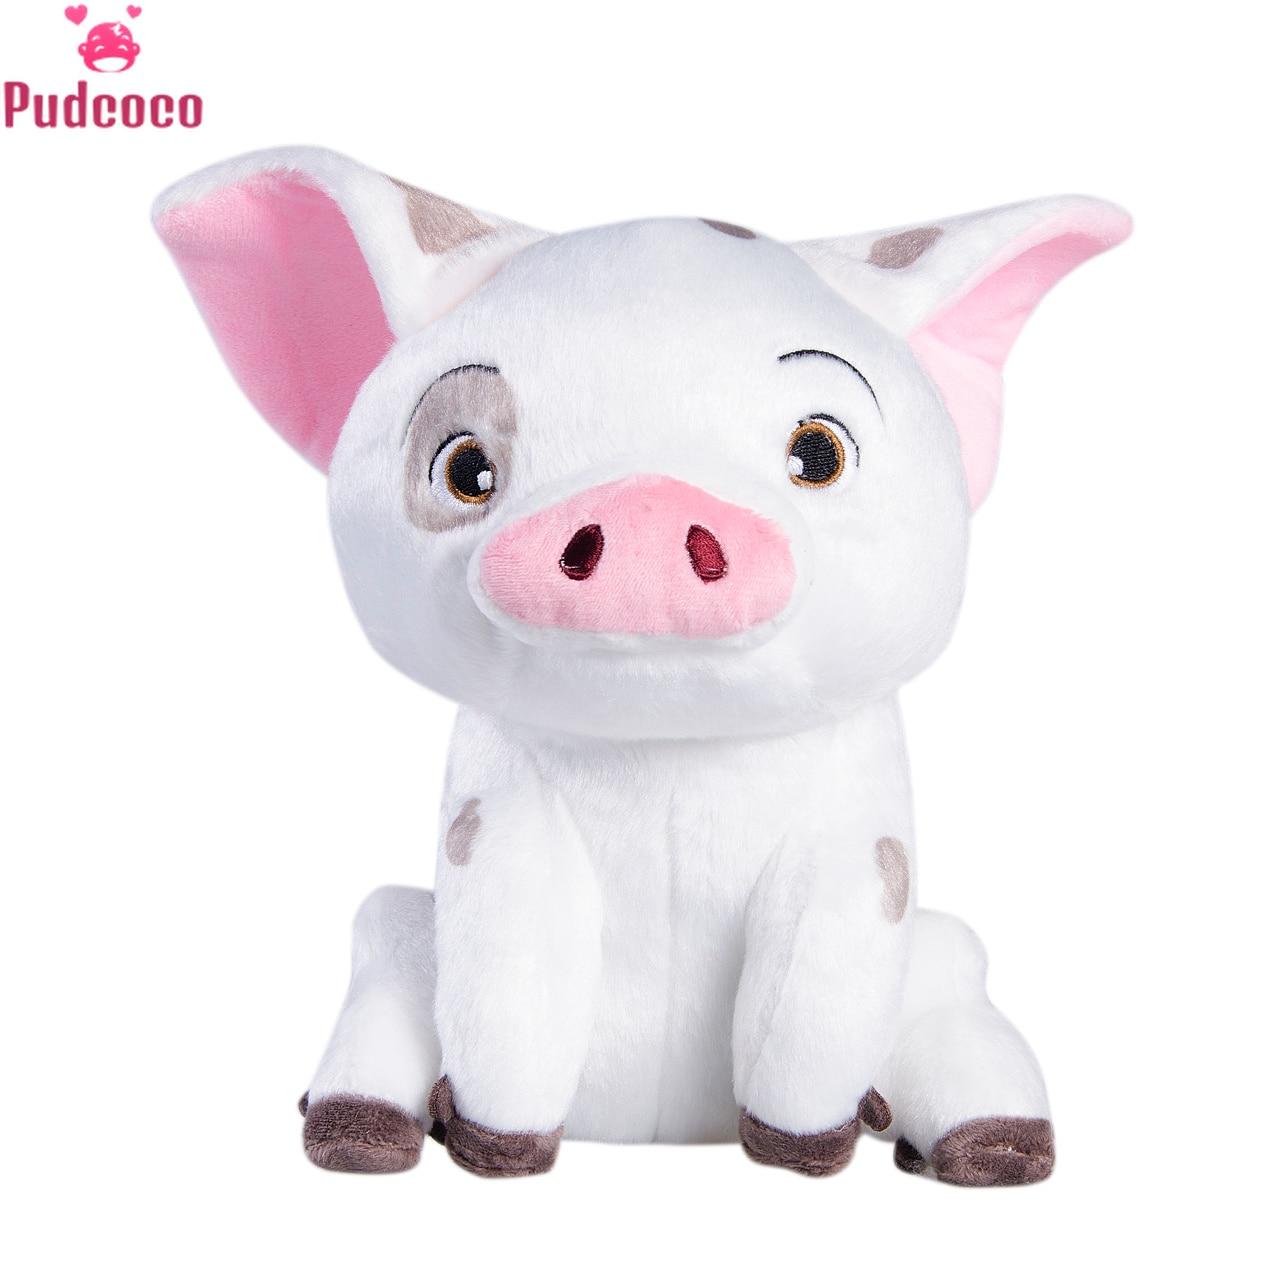 US $5 12 OFF Hot Sale Moana Babi Hewan Peliharaan Pua Boneka Hewan Lucu Kartun Boneka Plush Lembut 22 Cm Mainan Anak Perempuan 9 Inch Babi